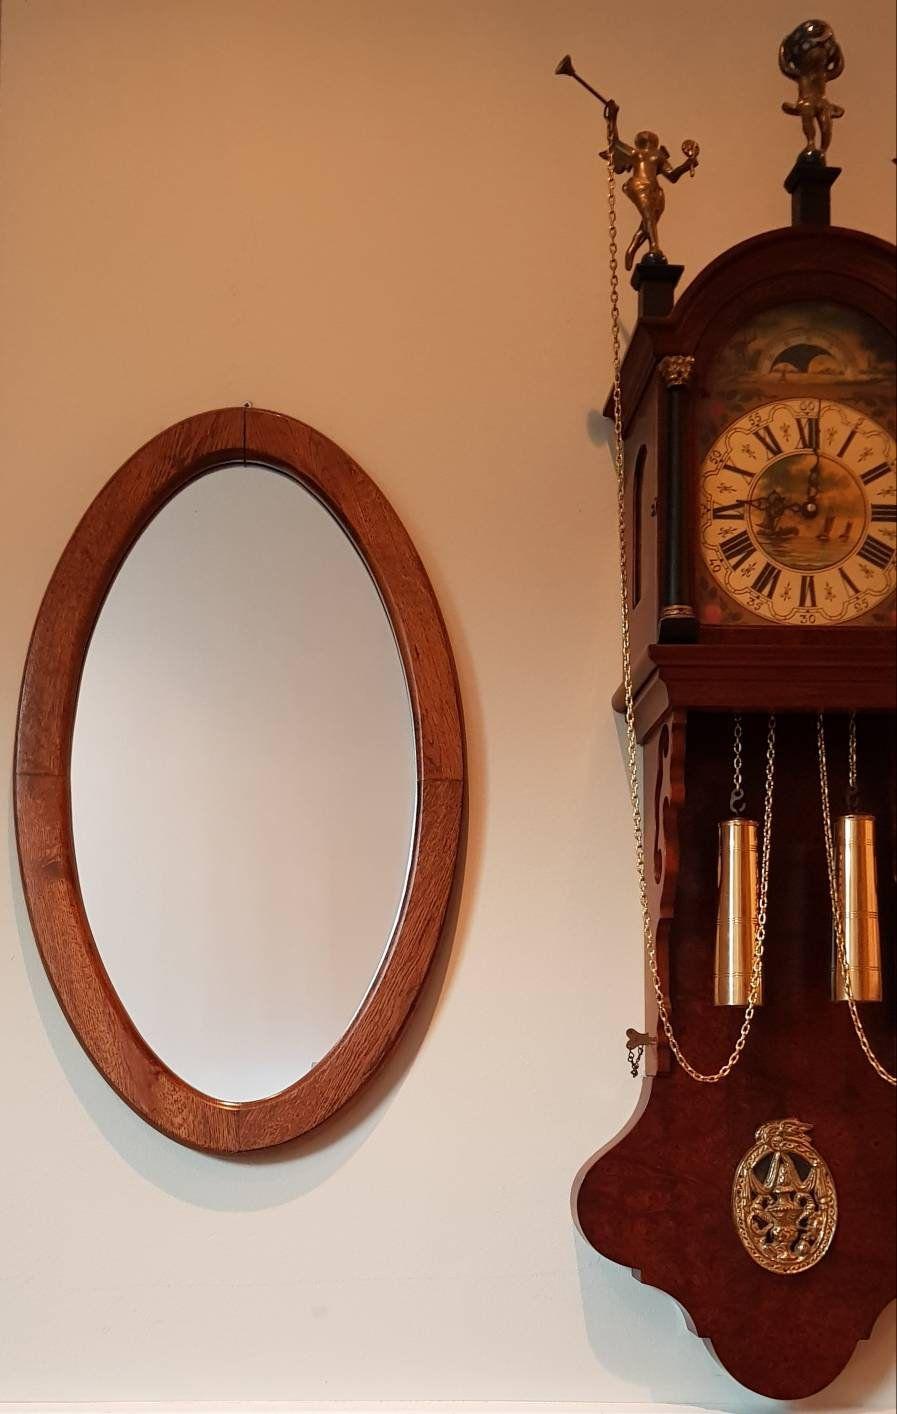 Big Oval Vintage Mirror Nice Wooden Frame Wall Hanging Etsy Vintage Mirror Wall Hanging Wall Mirror Vintage Clock